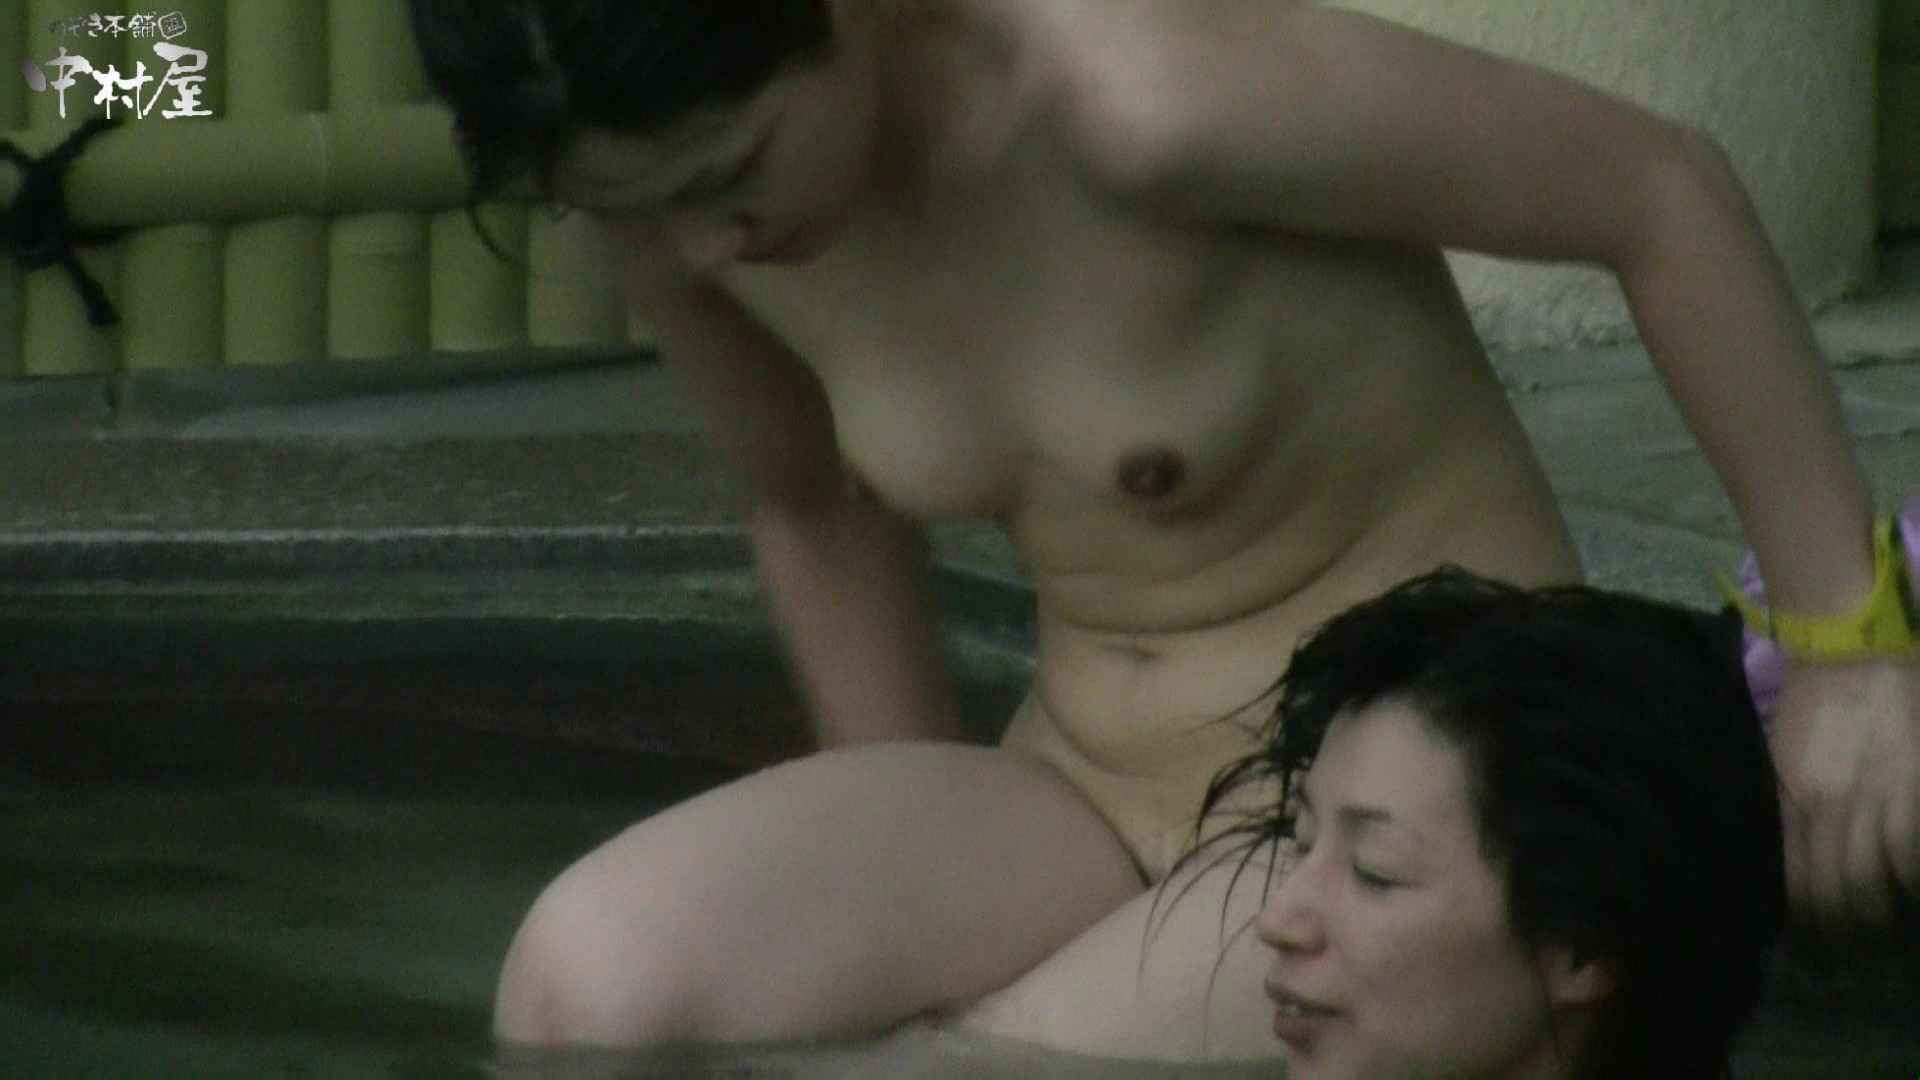 Aquaな露天風呂Vol.983 盗撮 | OLエロ画像  58PICs 22